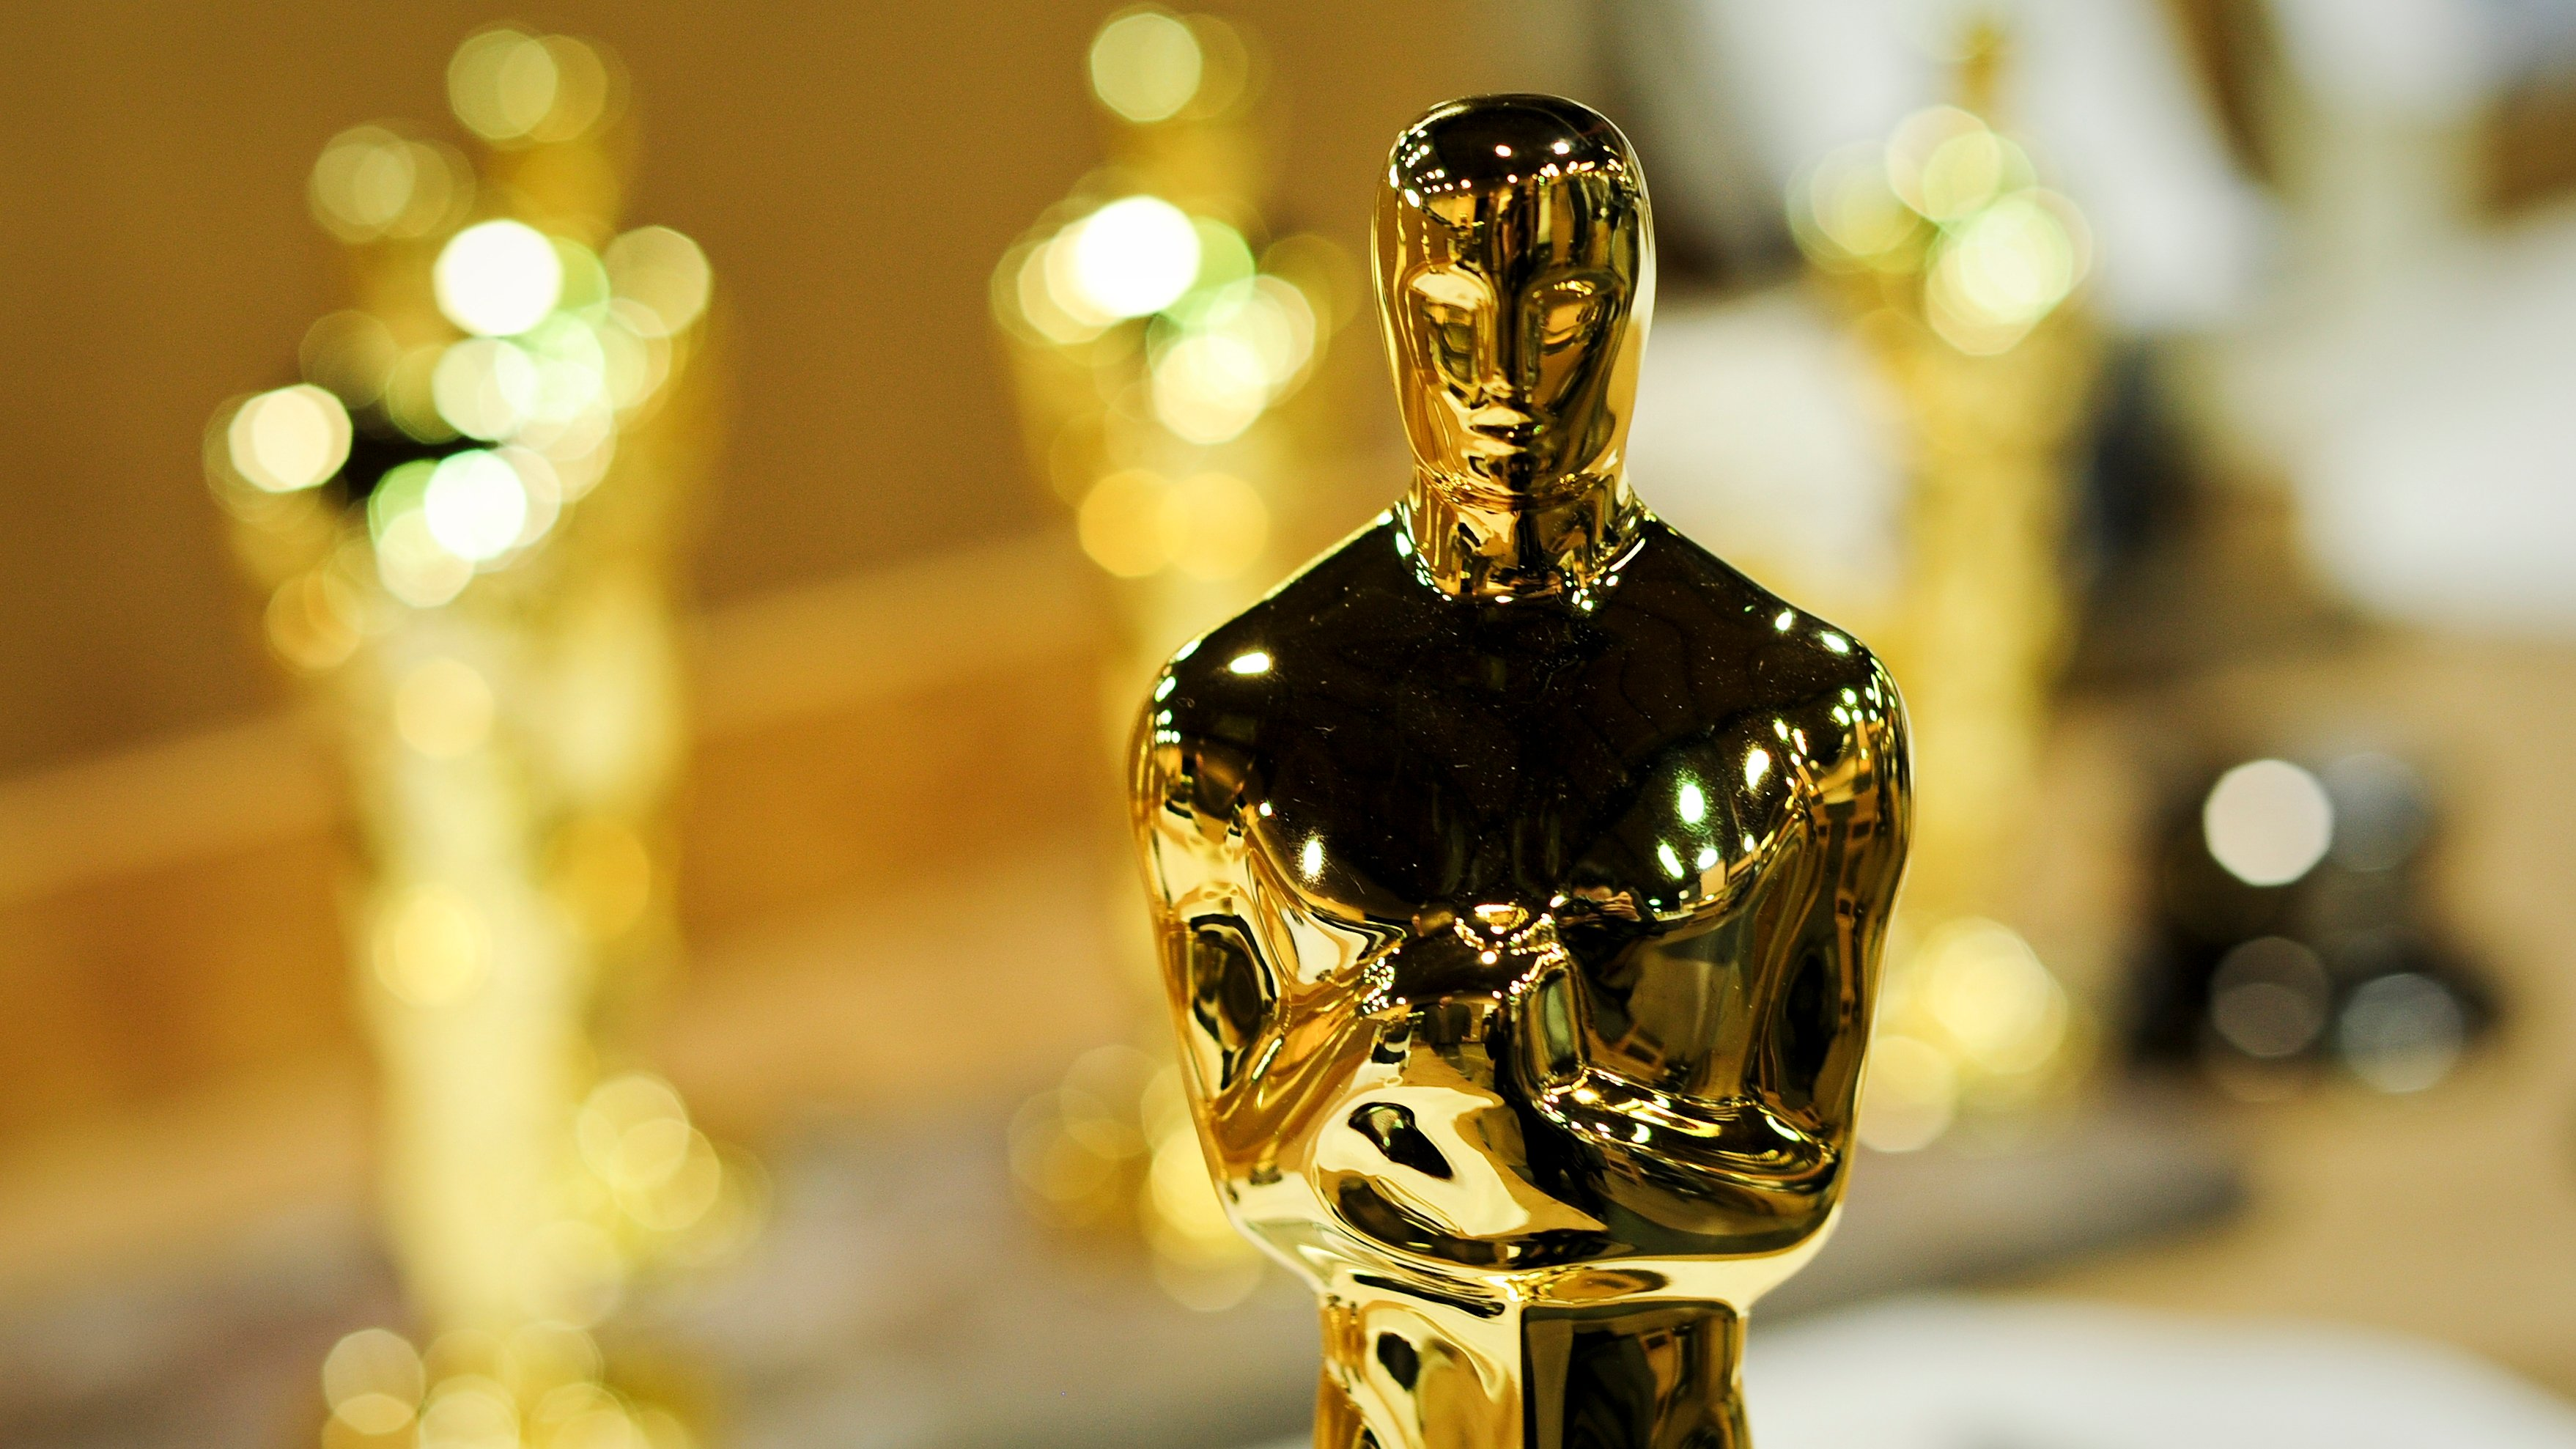 Oscar Gold Oscar Gold new pictures